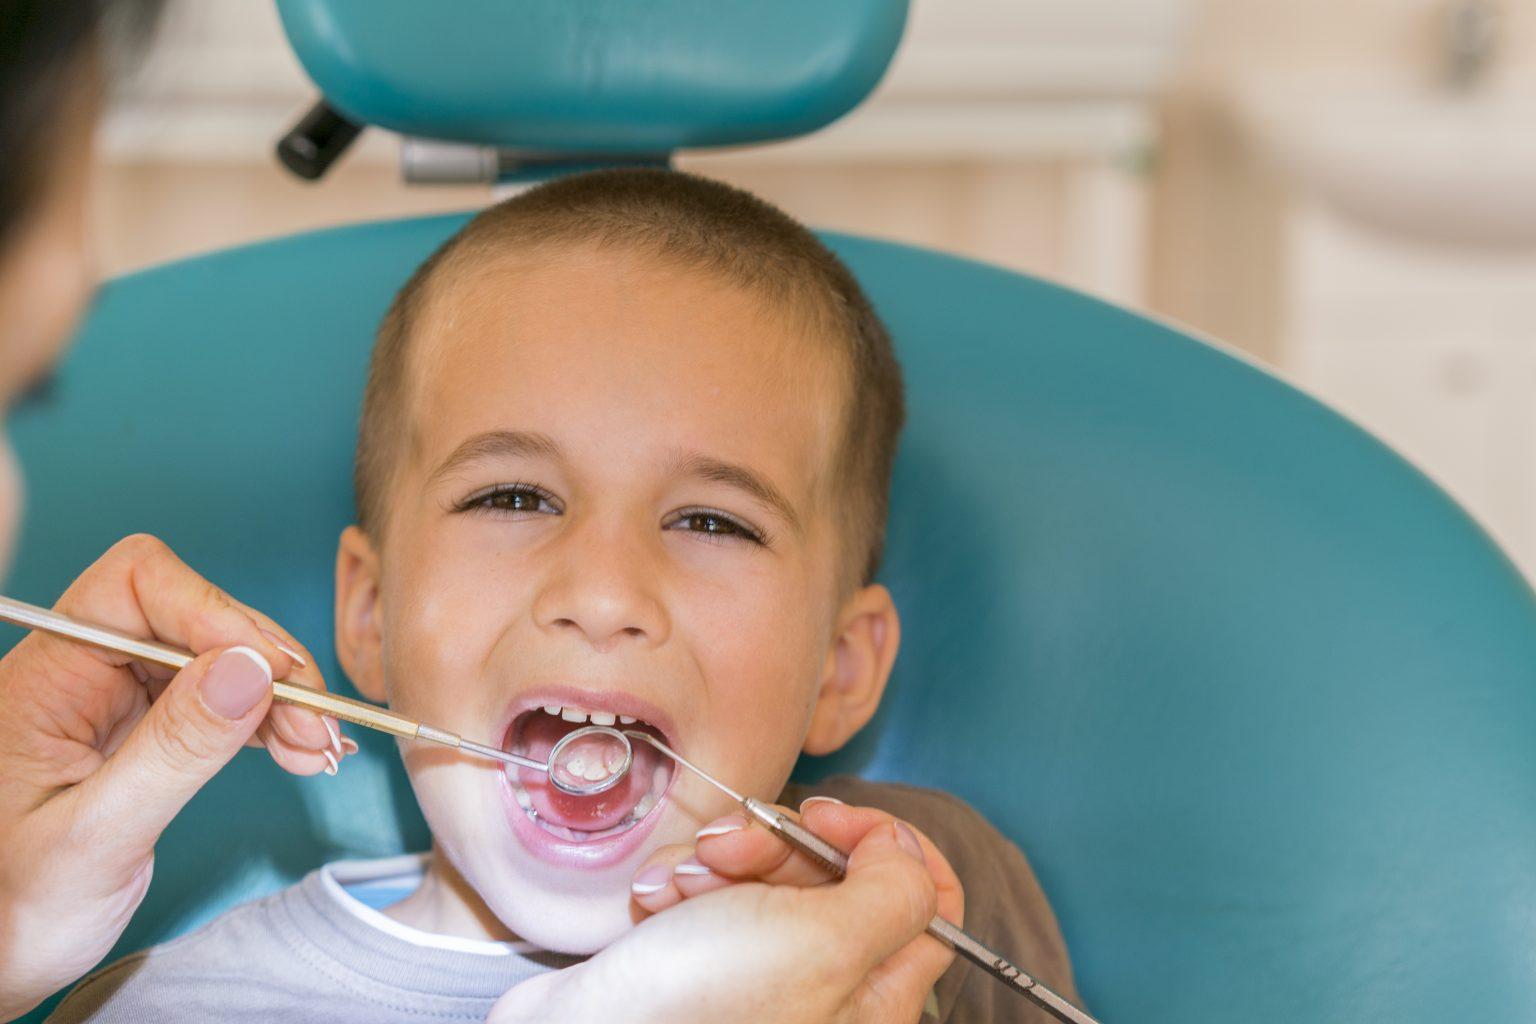 Pediatric Dentist Examining A Little Boys Teeth In The Dentists Chair At The Dental Clinic. Dentist Examining Little Boy's Teeth In Clinic